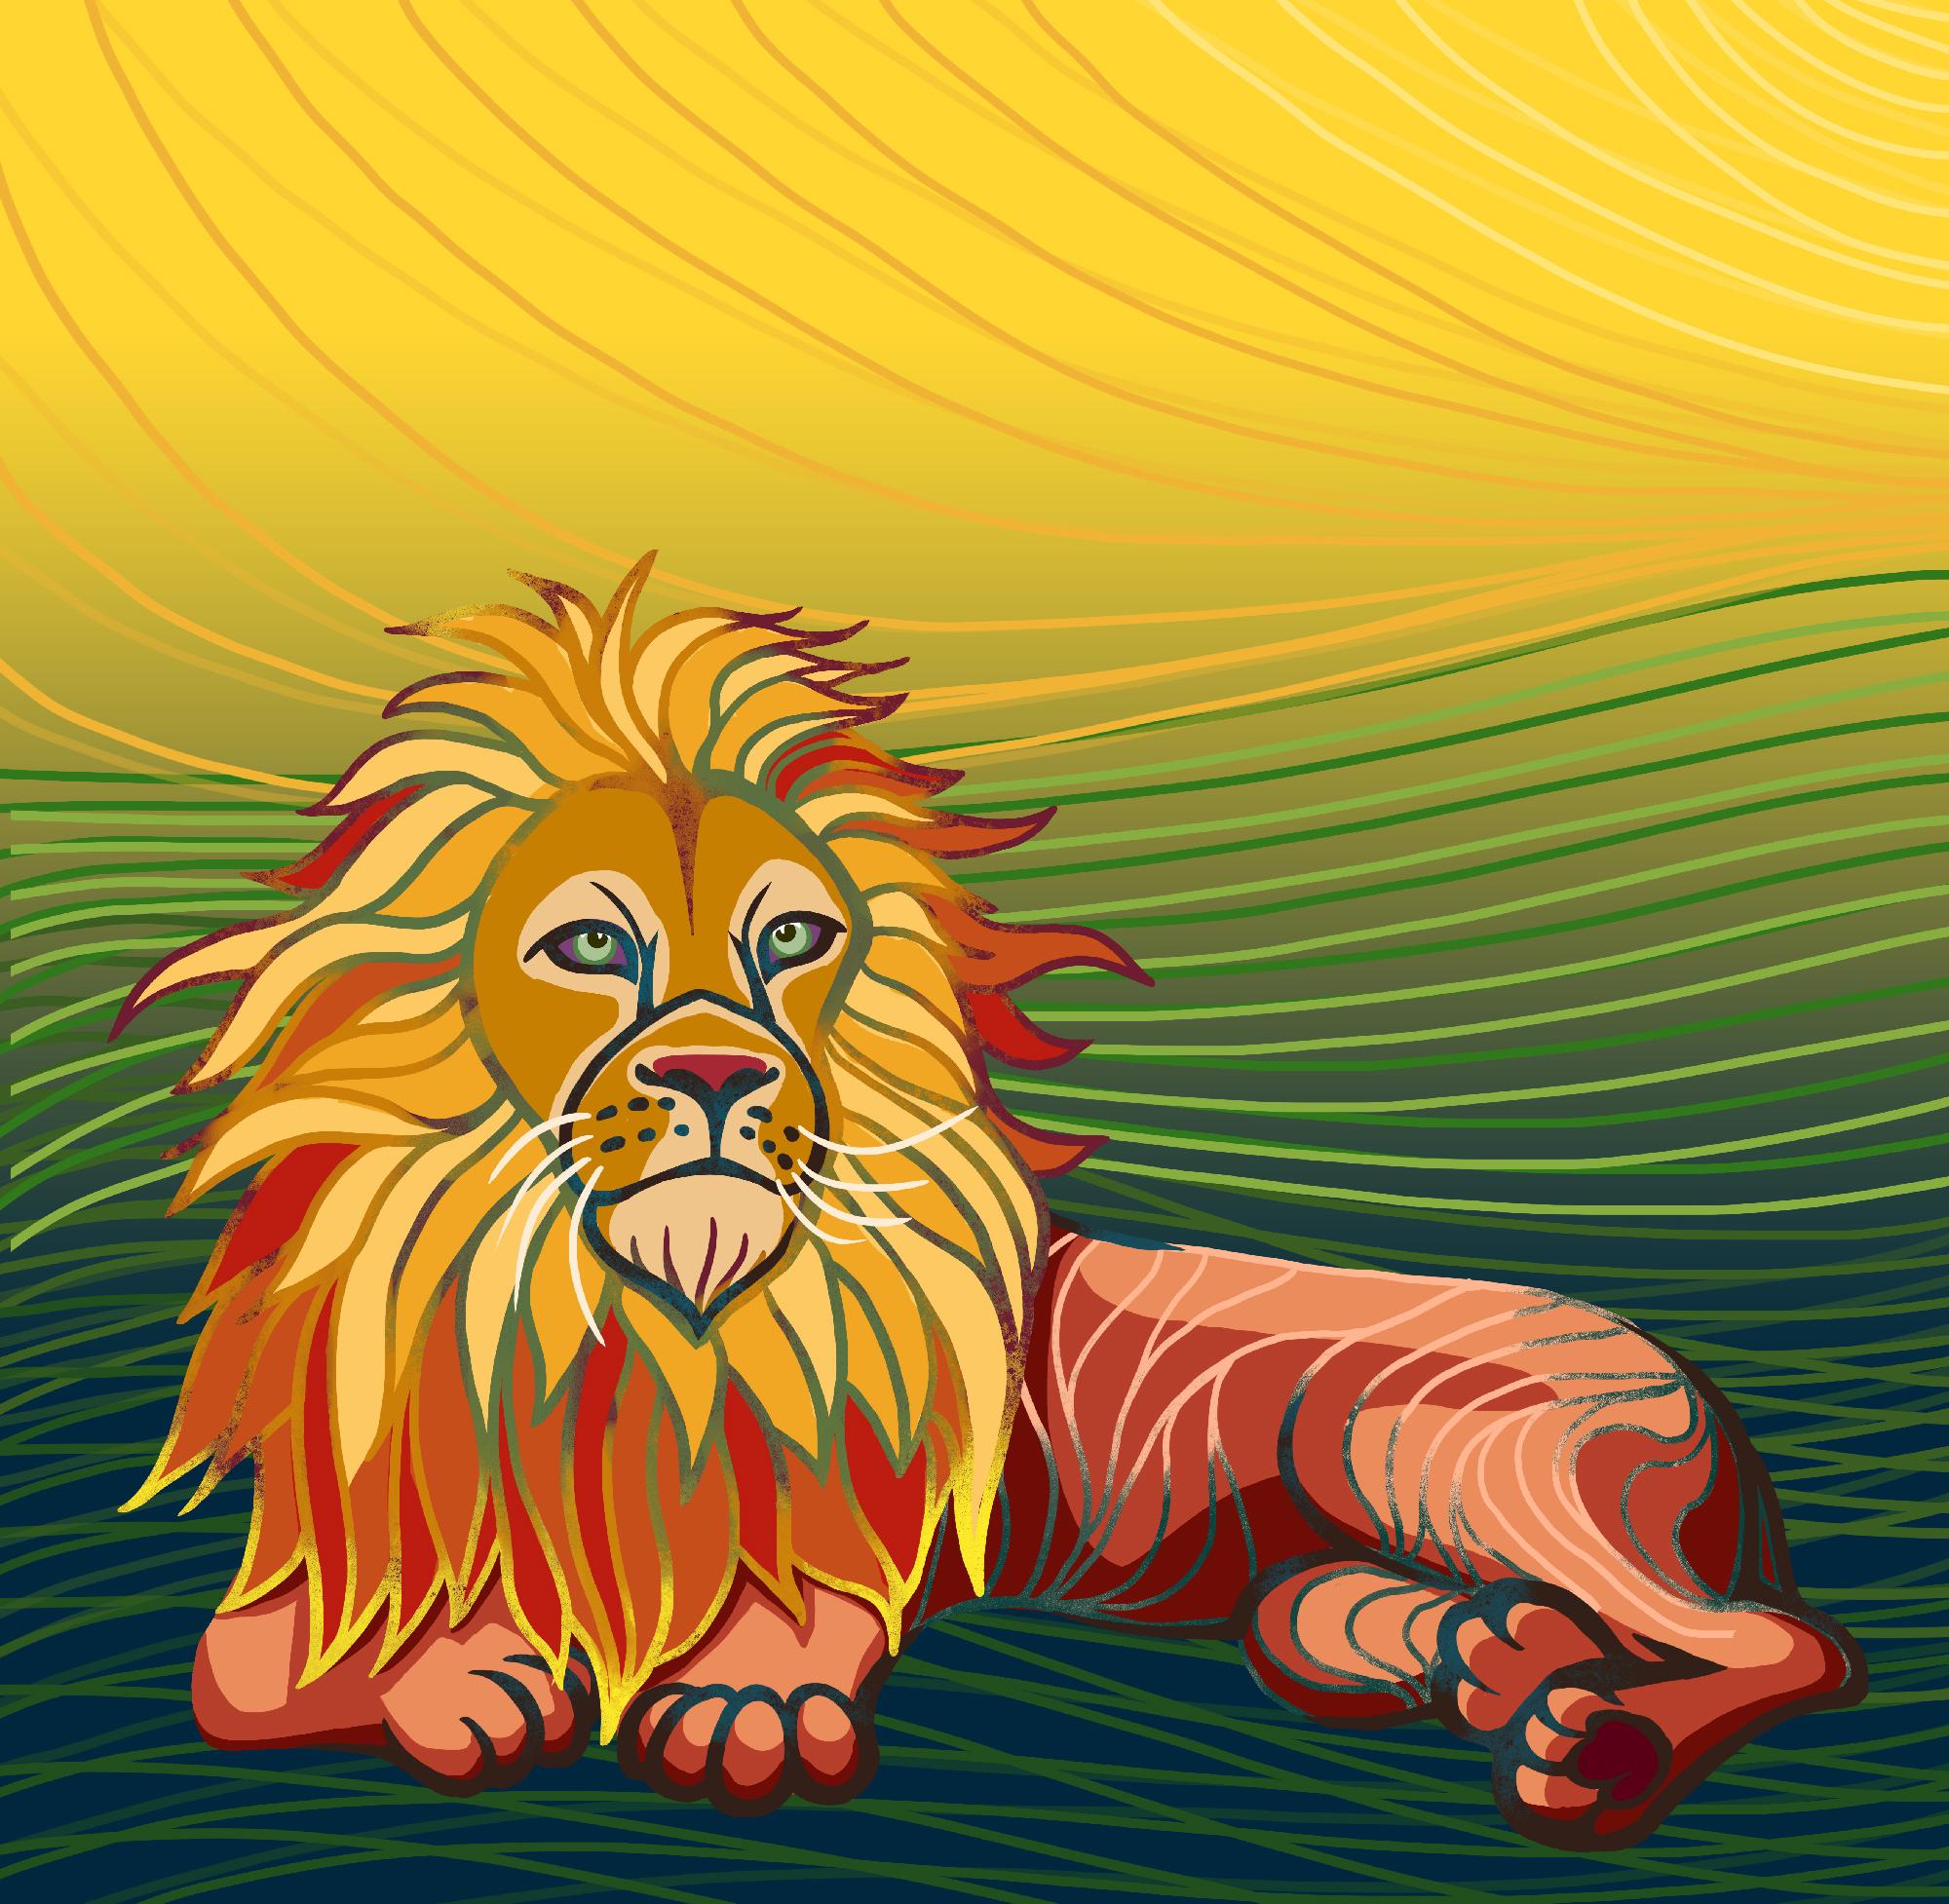 lion_wanchingyeh_illustration.jpg